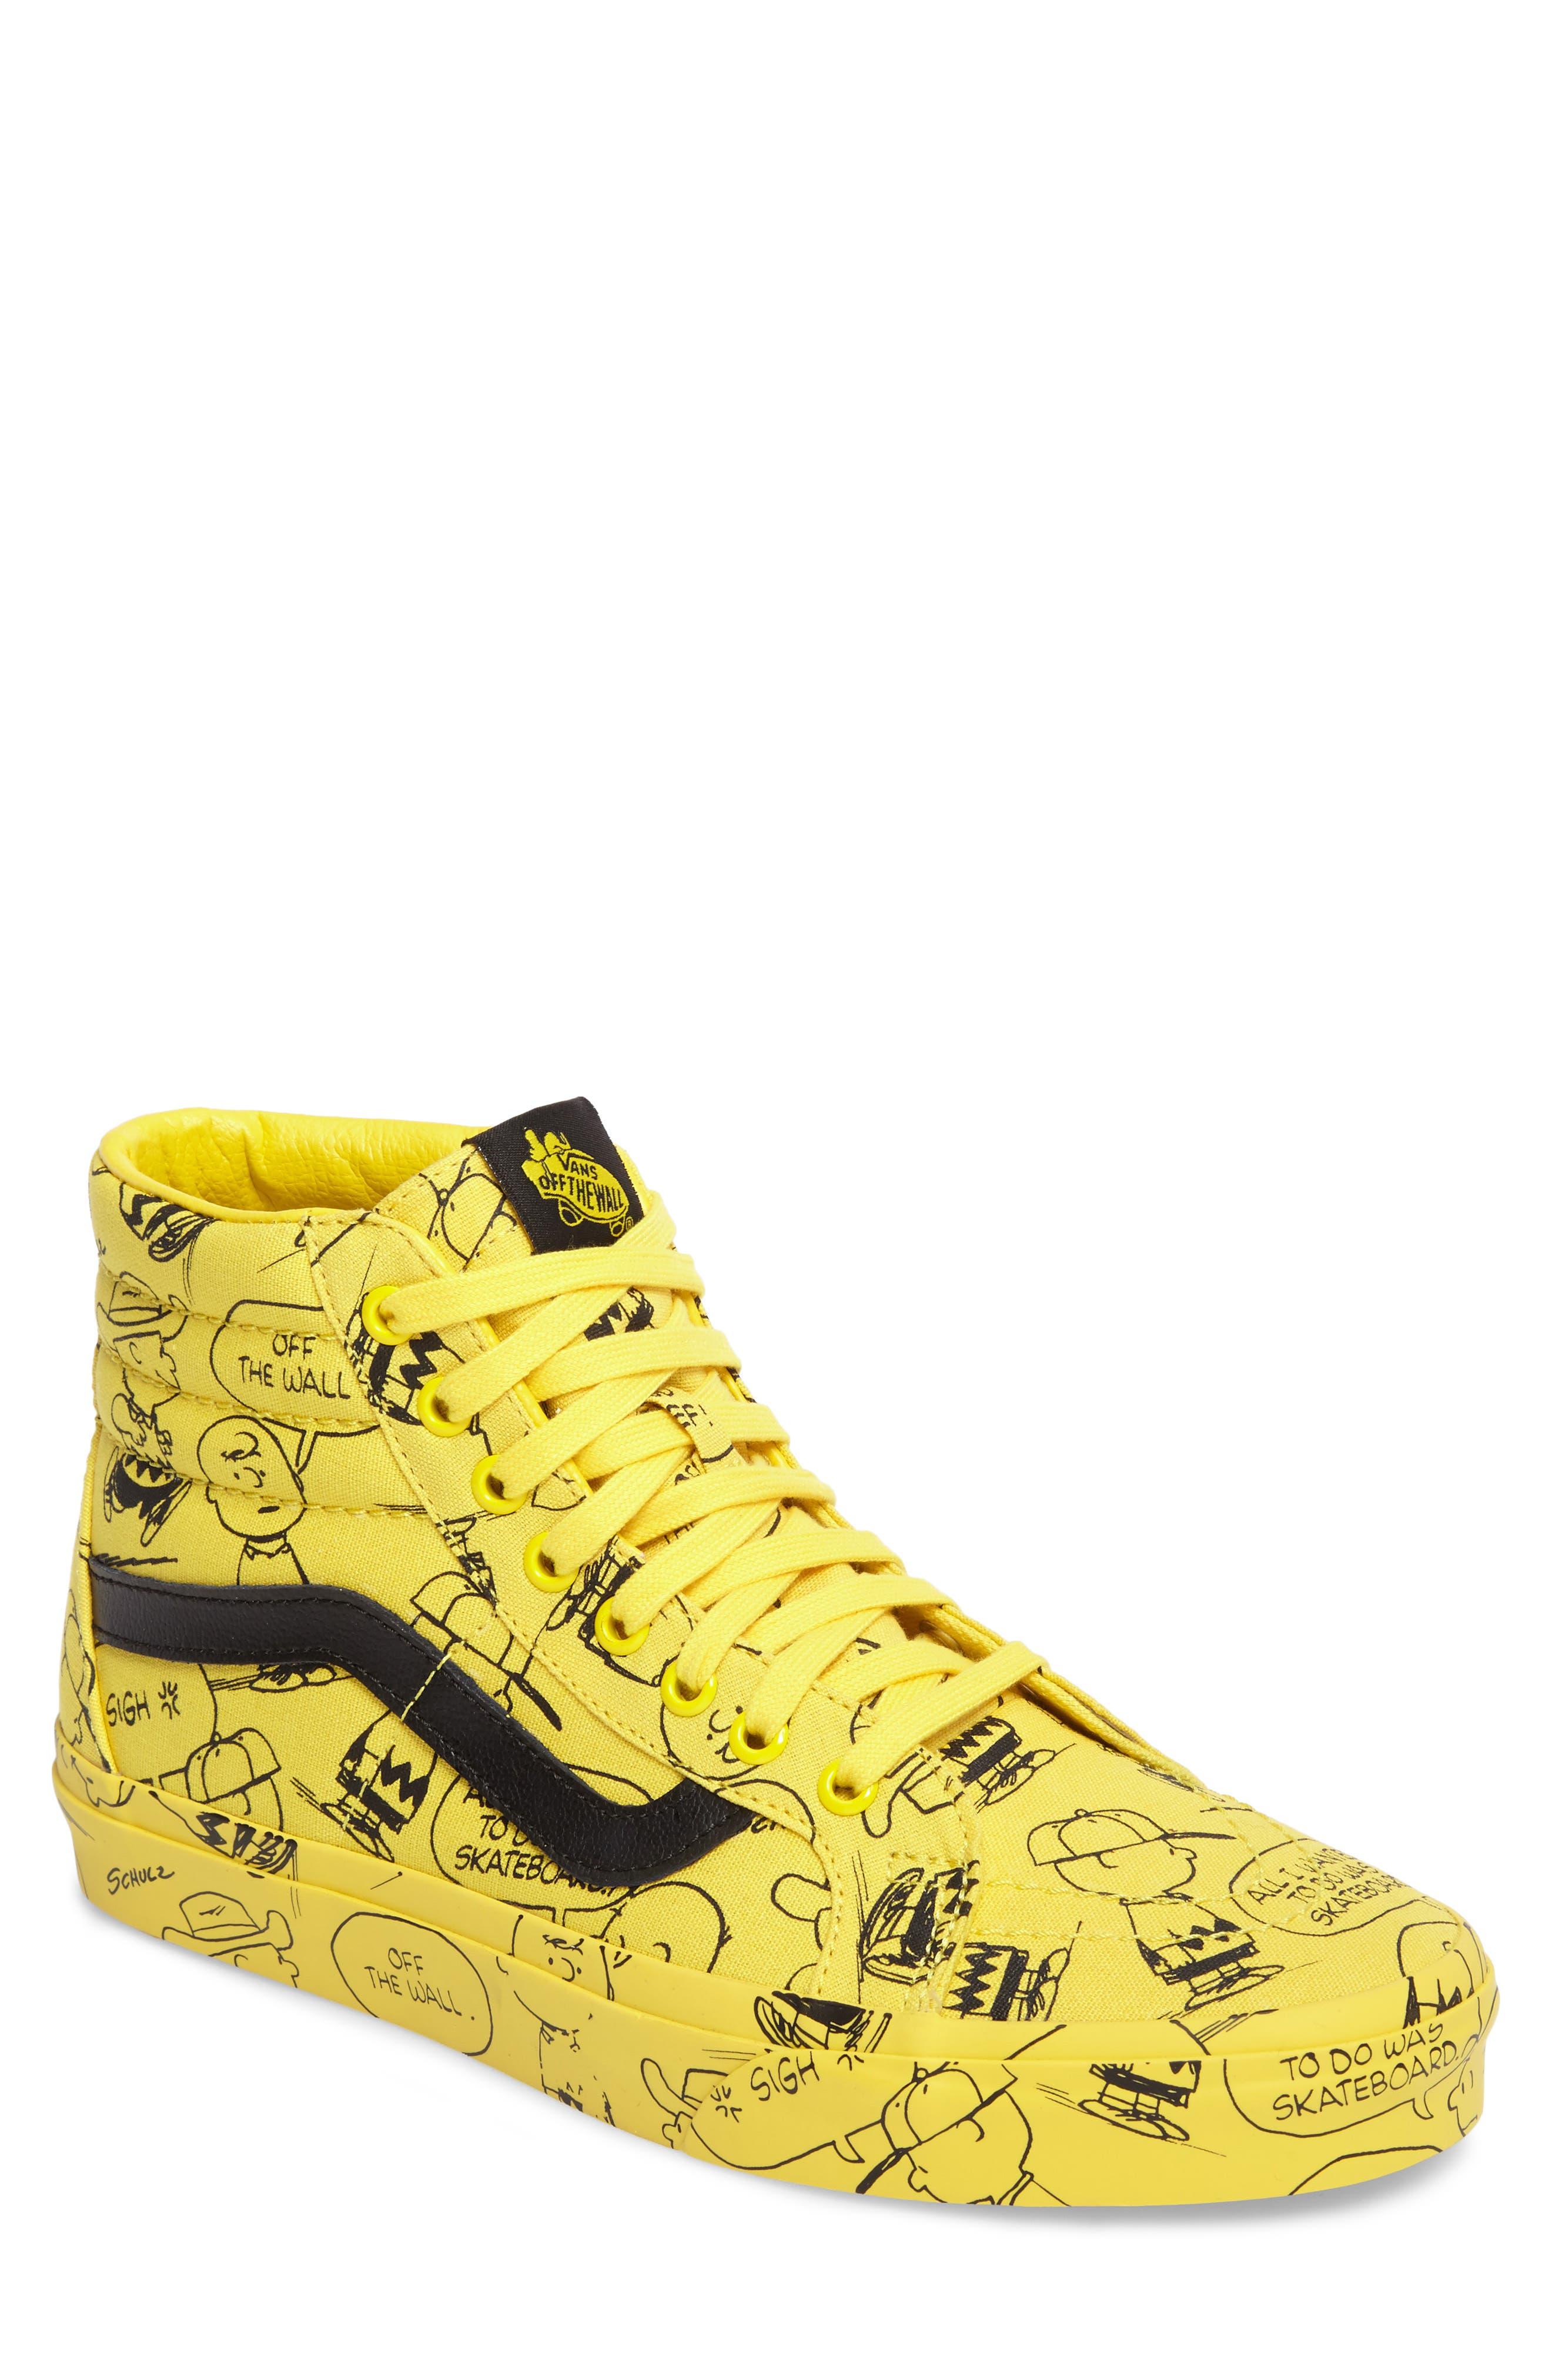 x Peanuts<sup>®</sup> Sk8-Hi Reissue Sneaker,                             Main thumbnail 1, color,                             Maize Canvas